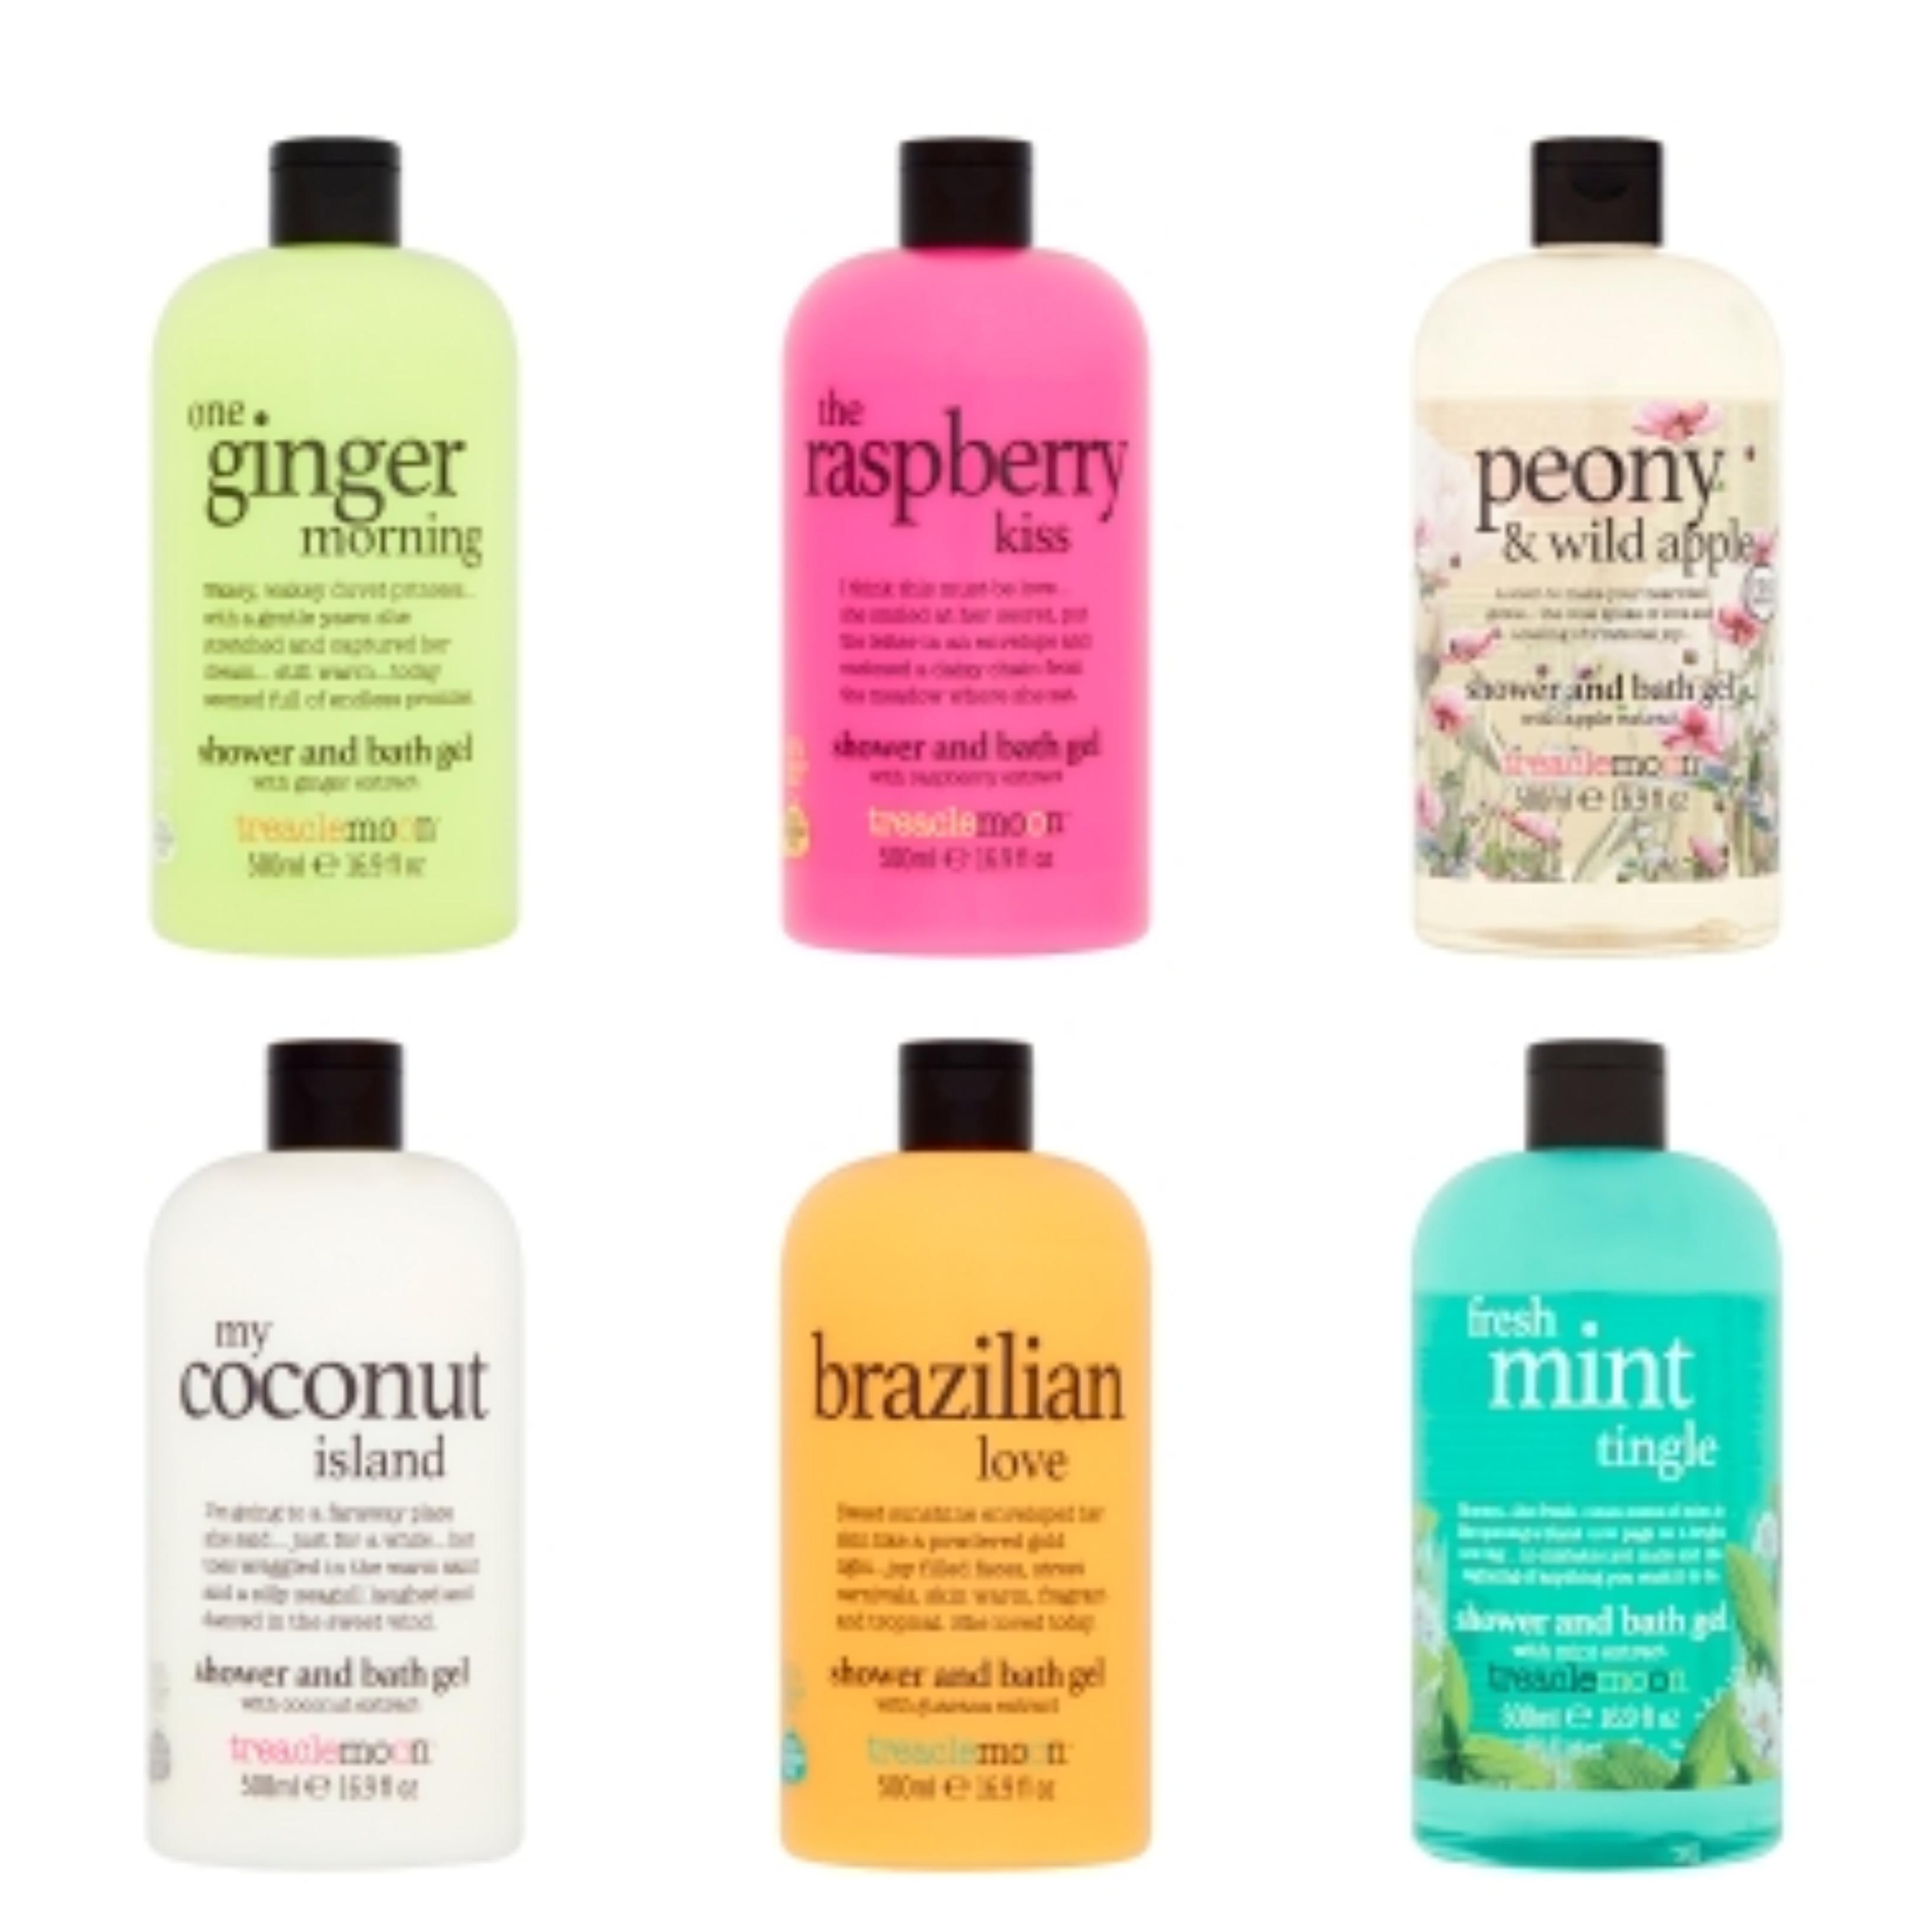 Treacle Moon Shower/Bath Gel 500ml - 6 Products on Offer - £1.50 (Minimum spend applies) @ Waitrose & Partners